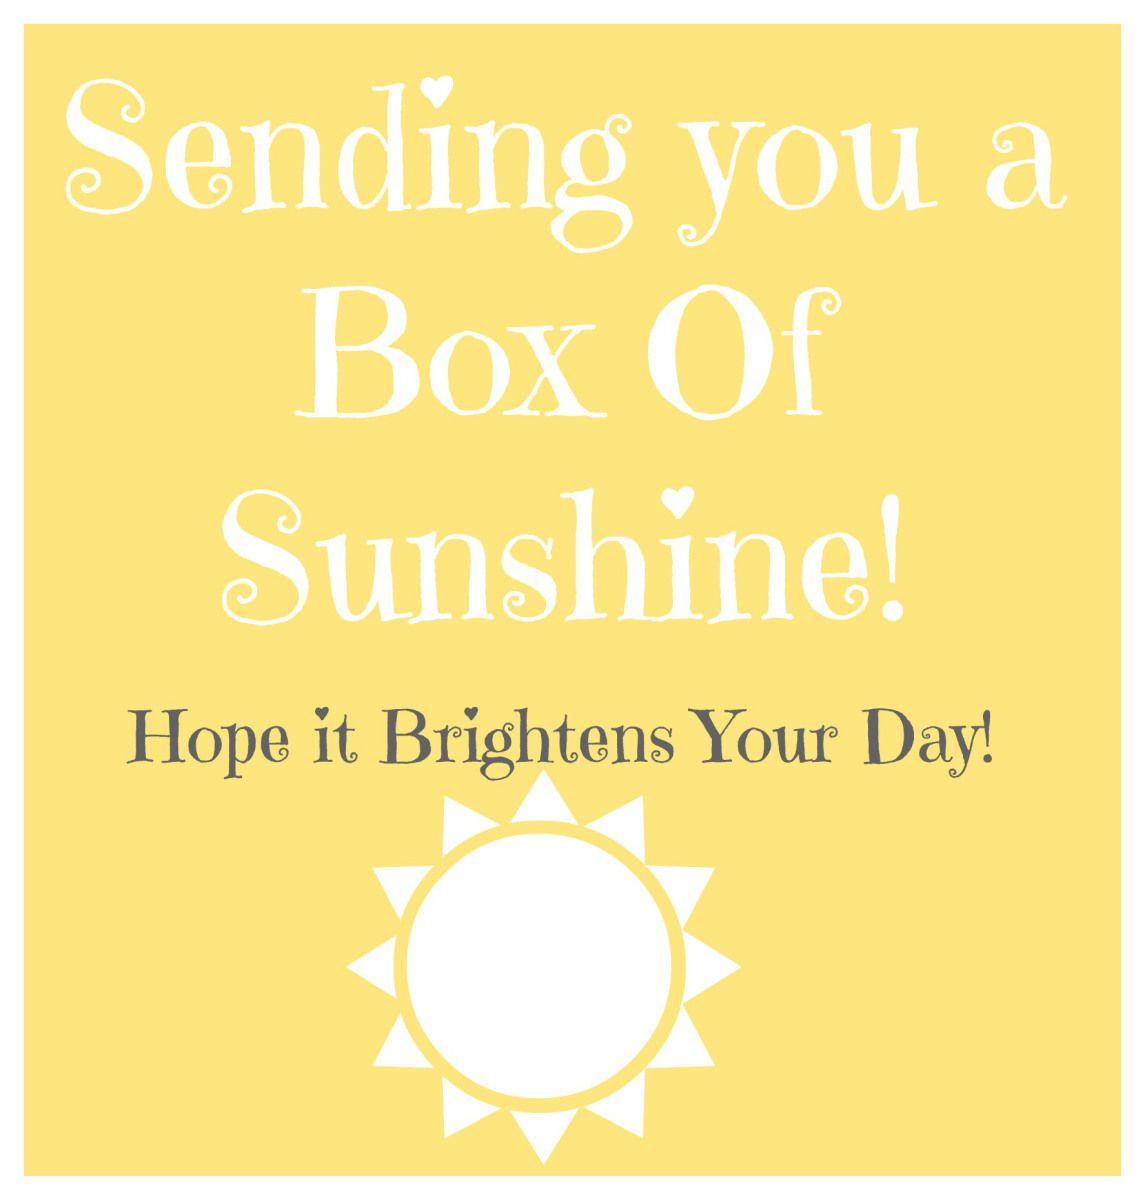 Box Of Sunshine // Free Printable // Rae Of Sparkles   Gift Ideas - Box Of Sunshine Free Printable